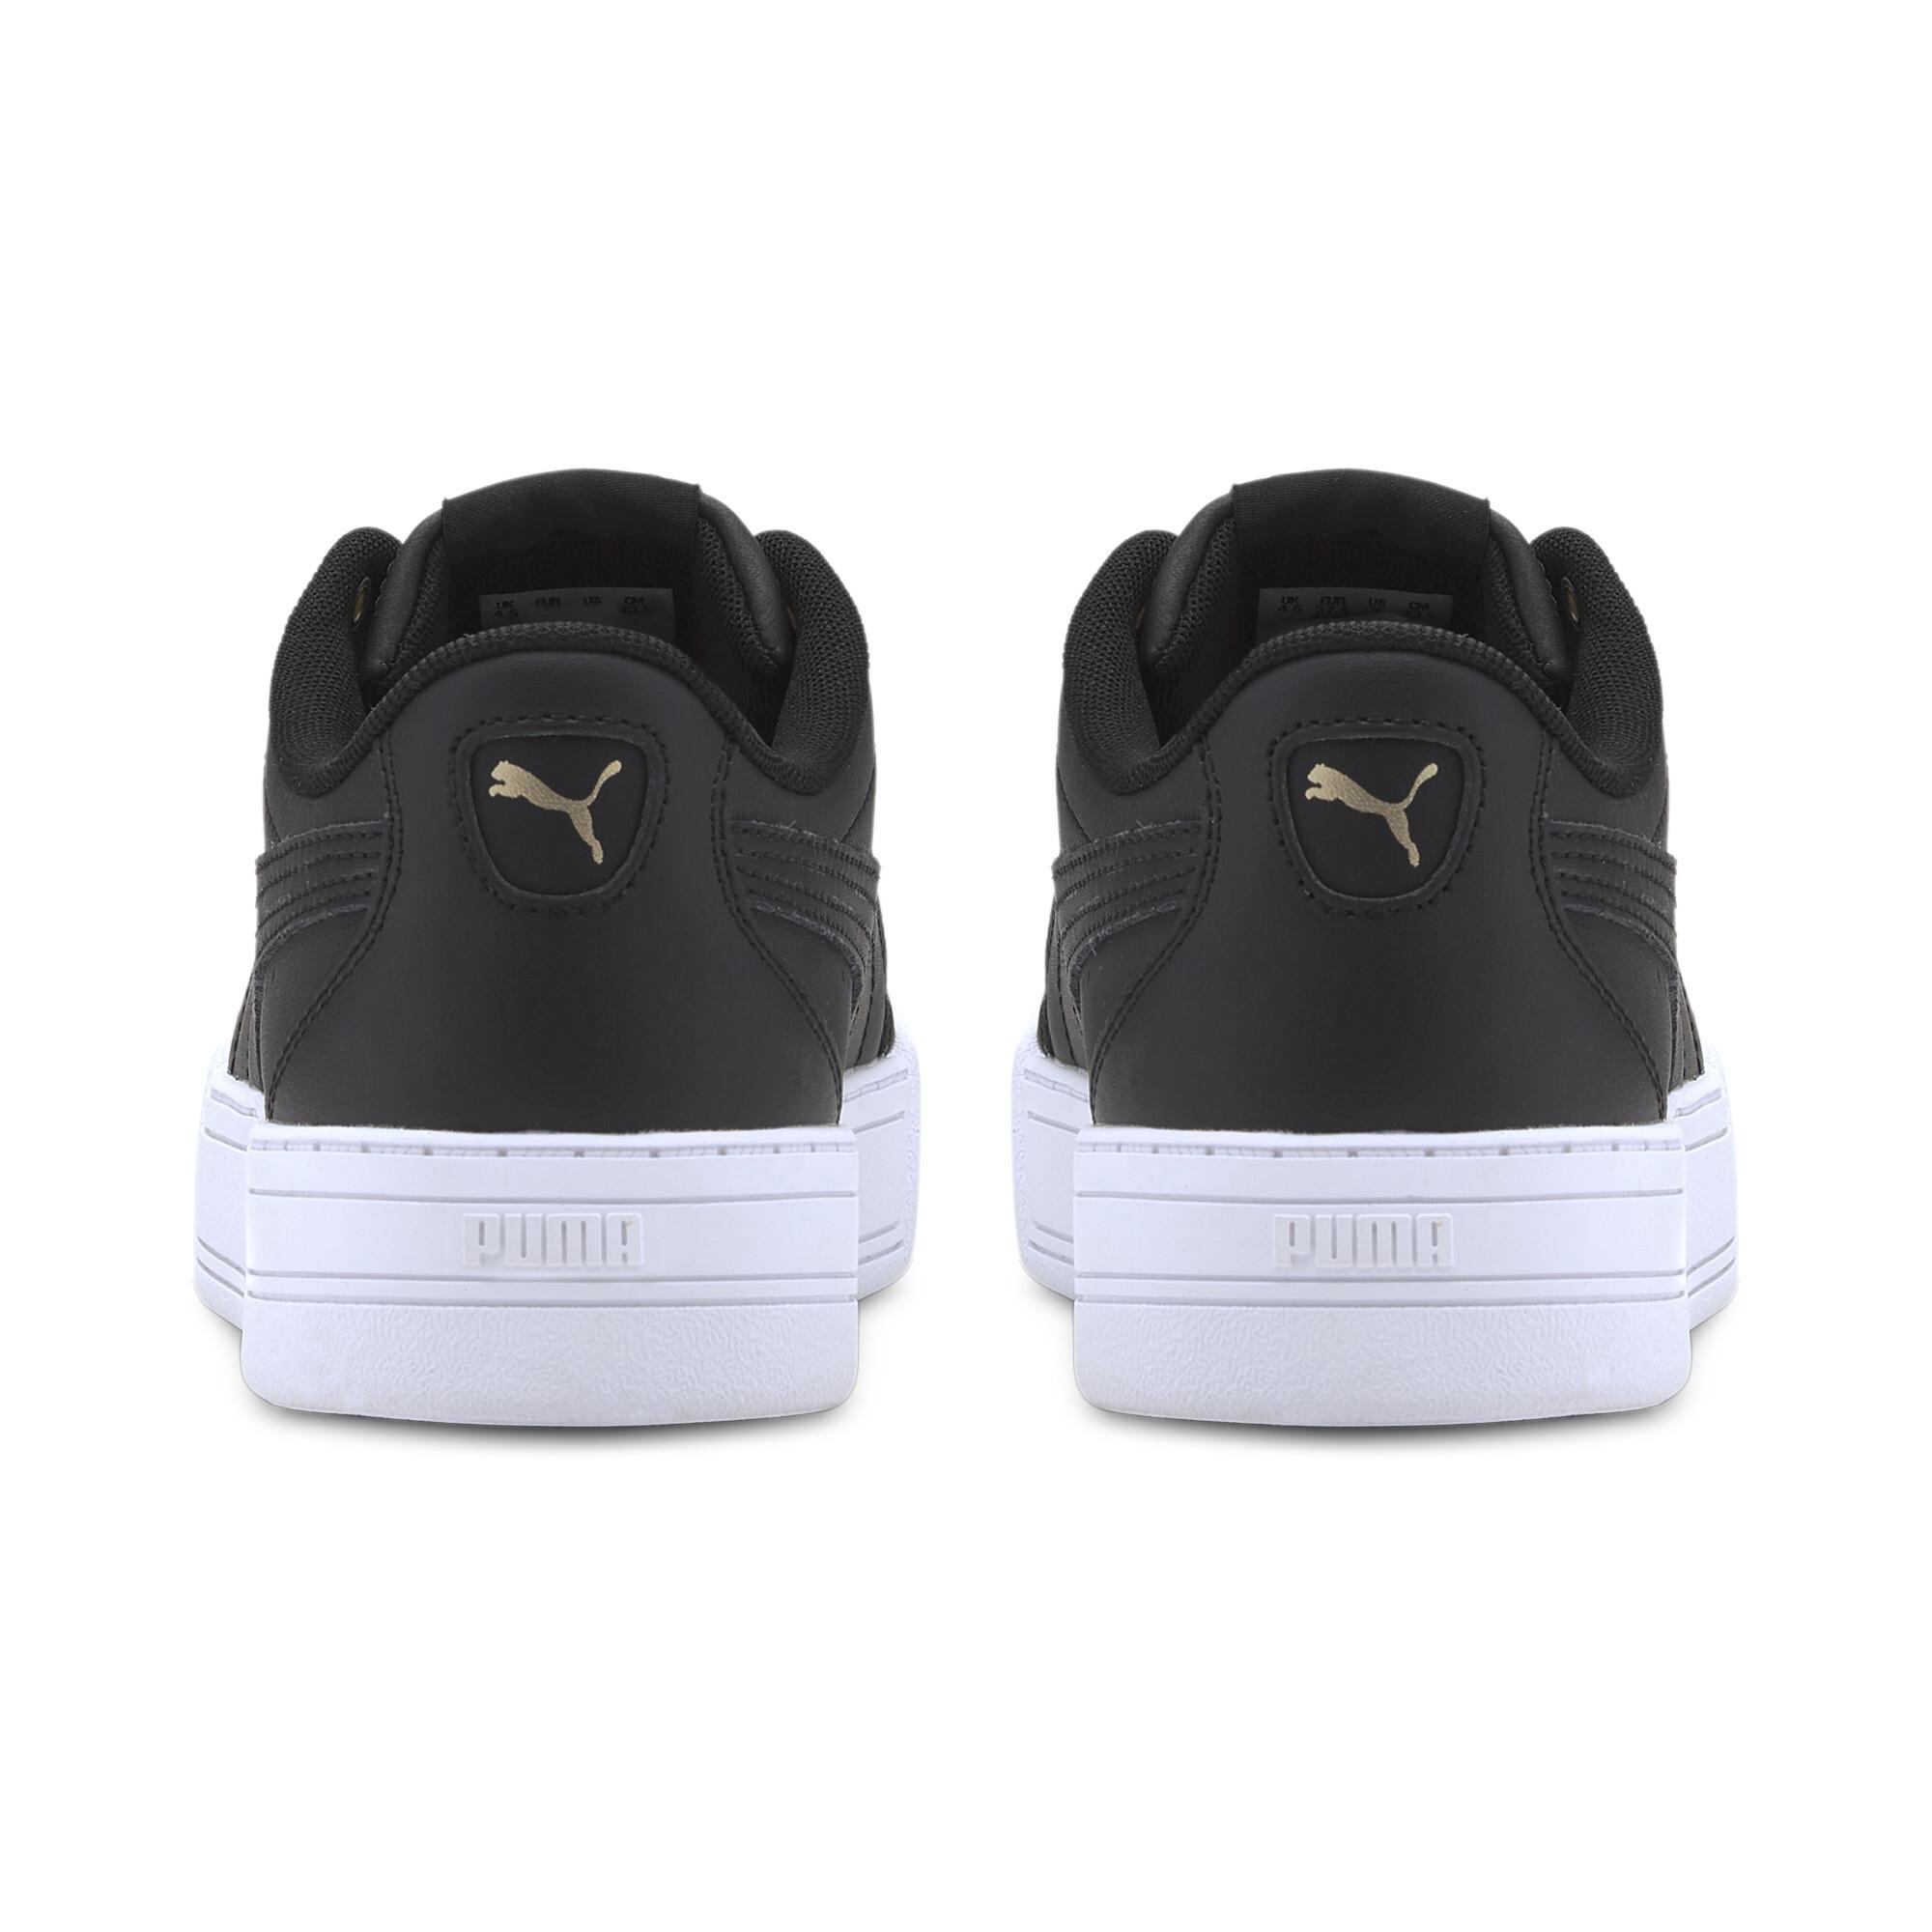 PUMA-Women-039-s-Skye-Sneakers thumbnail 9